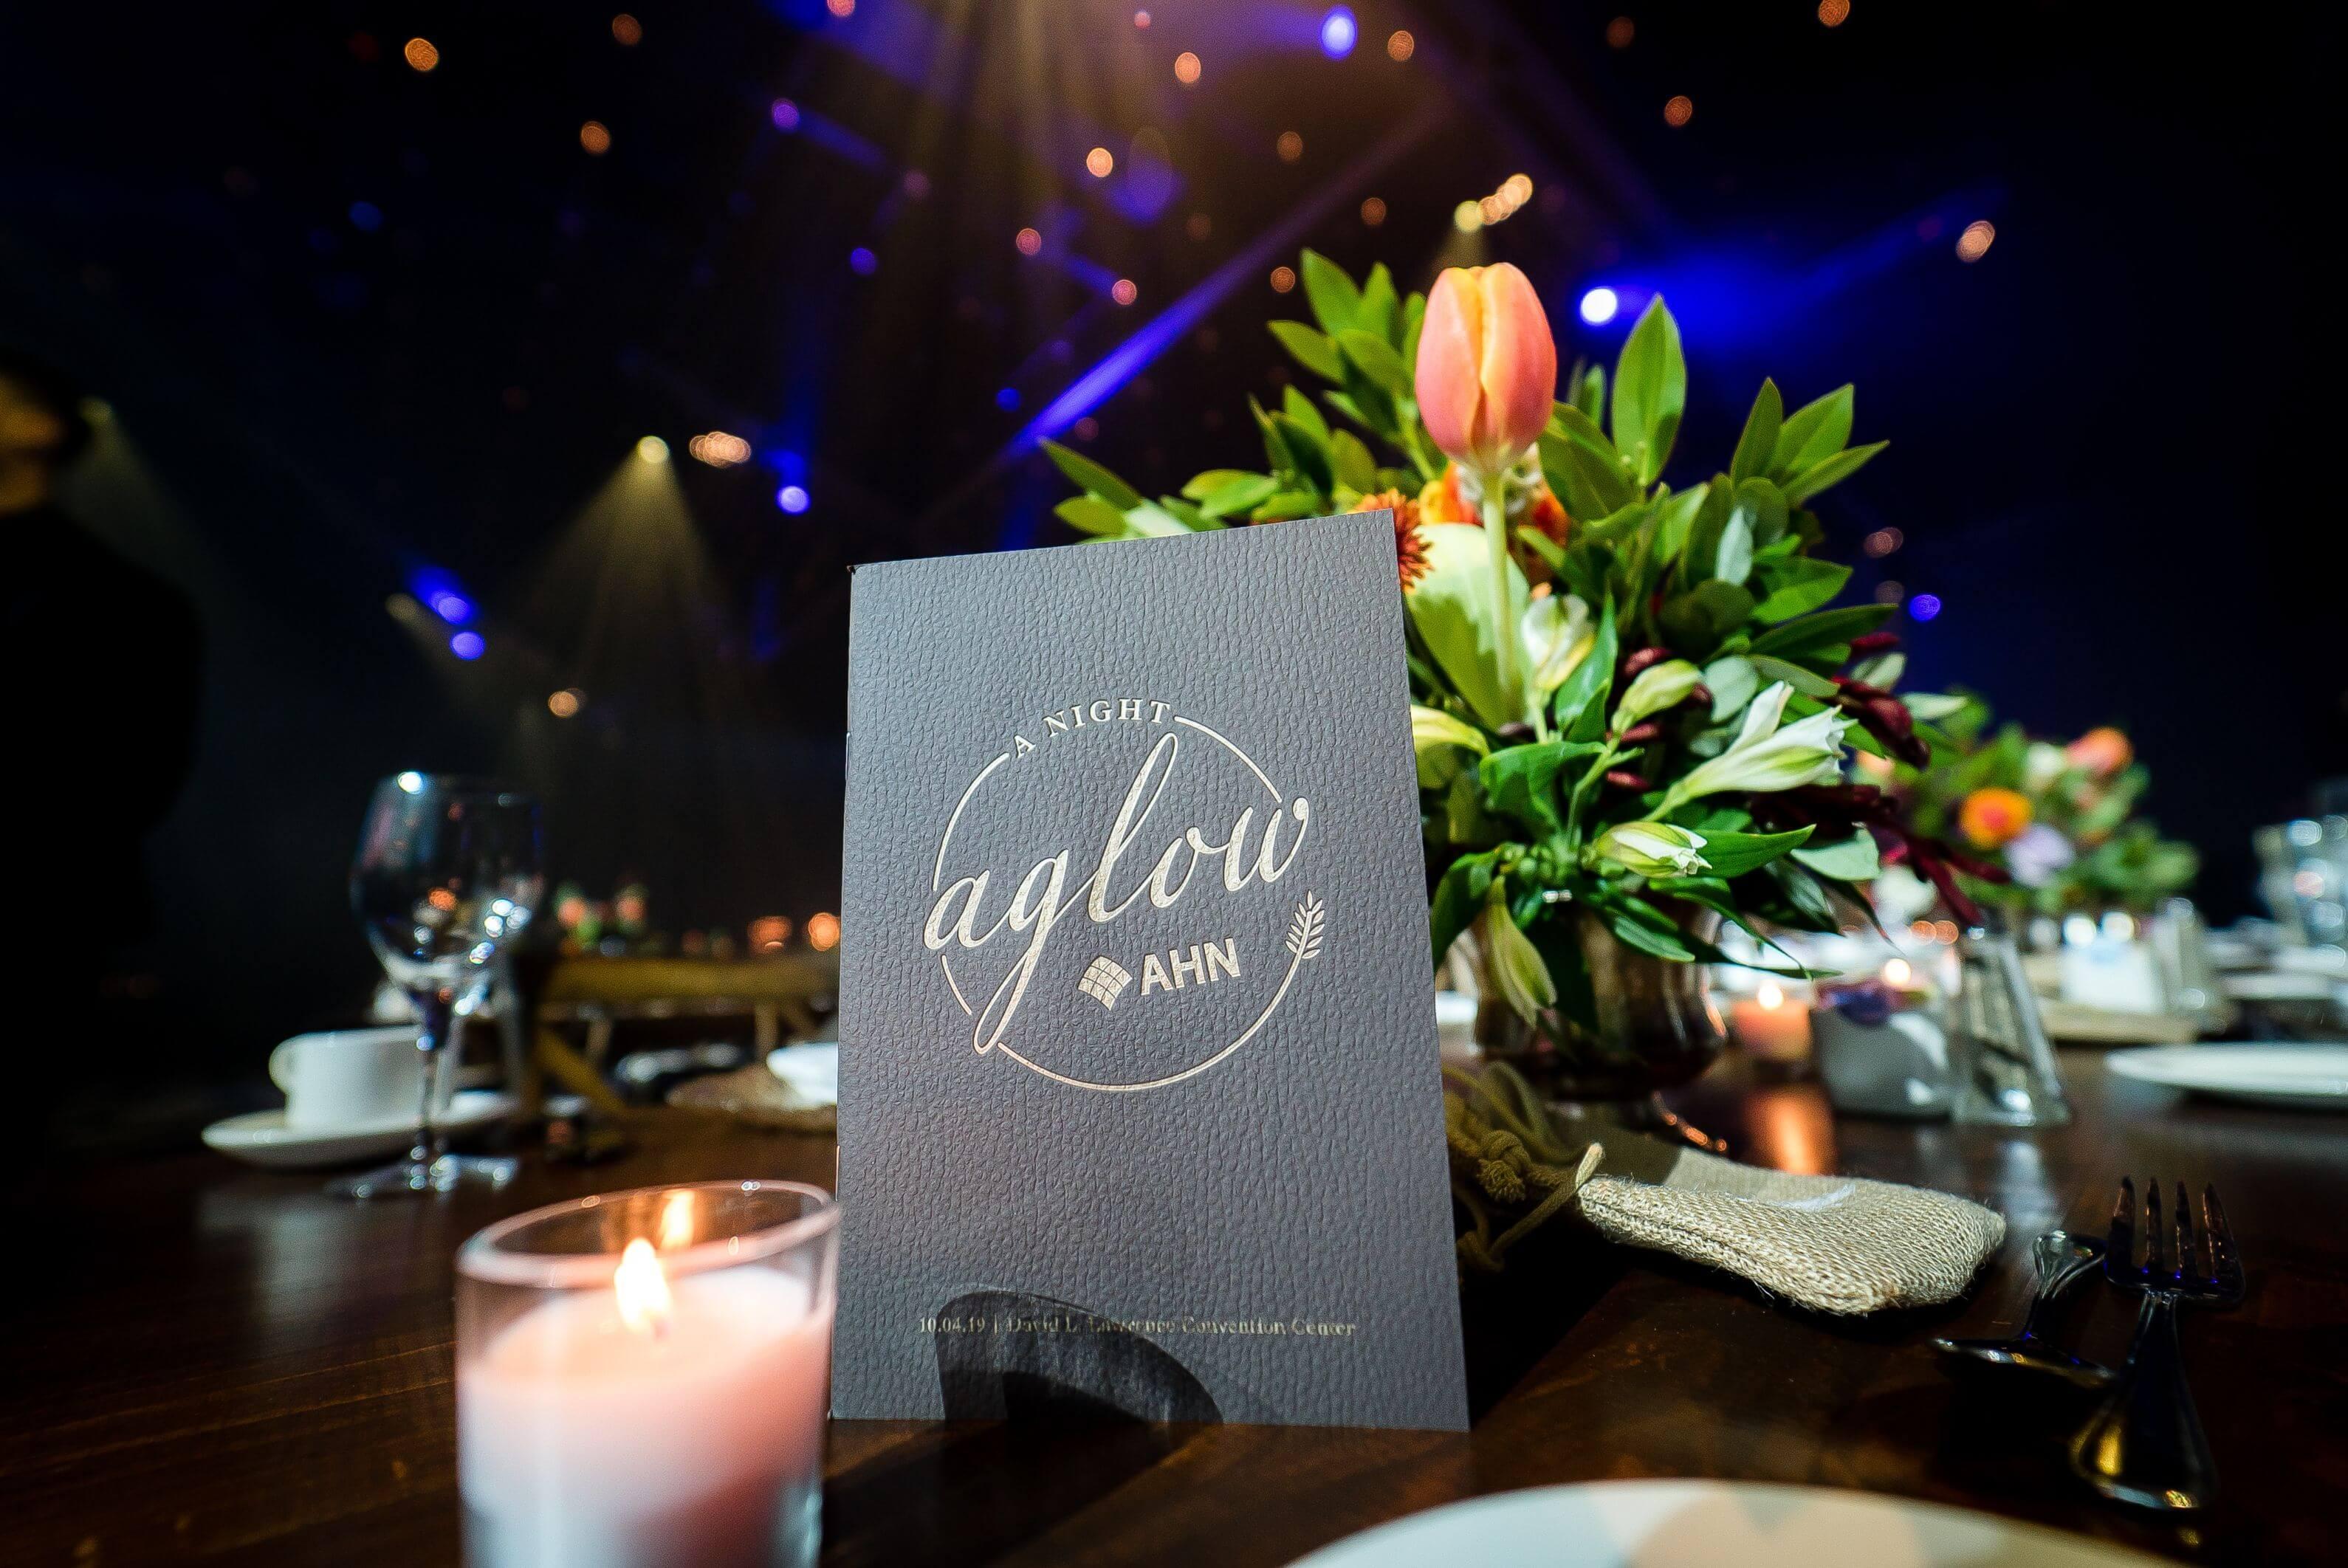 a night aglow gala